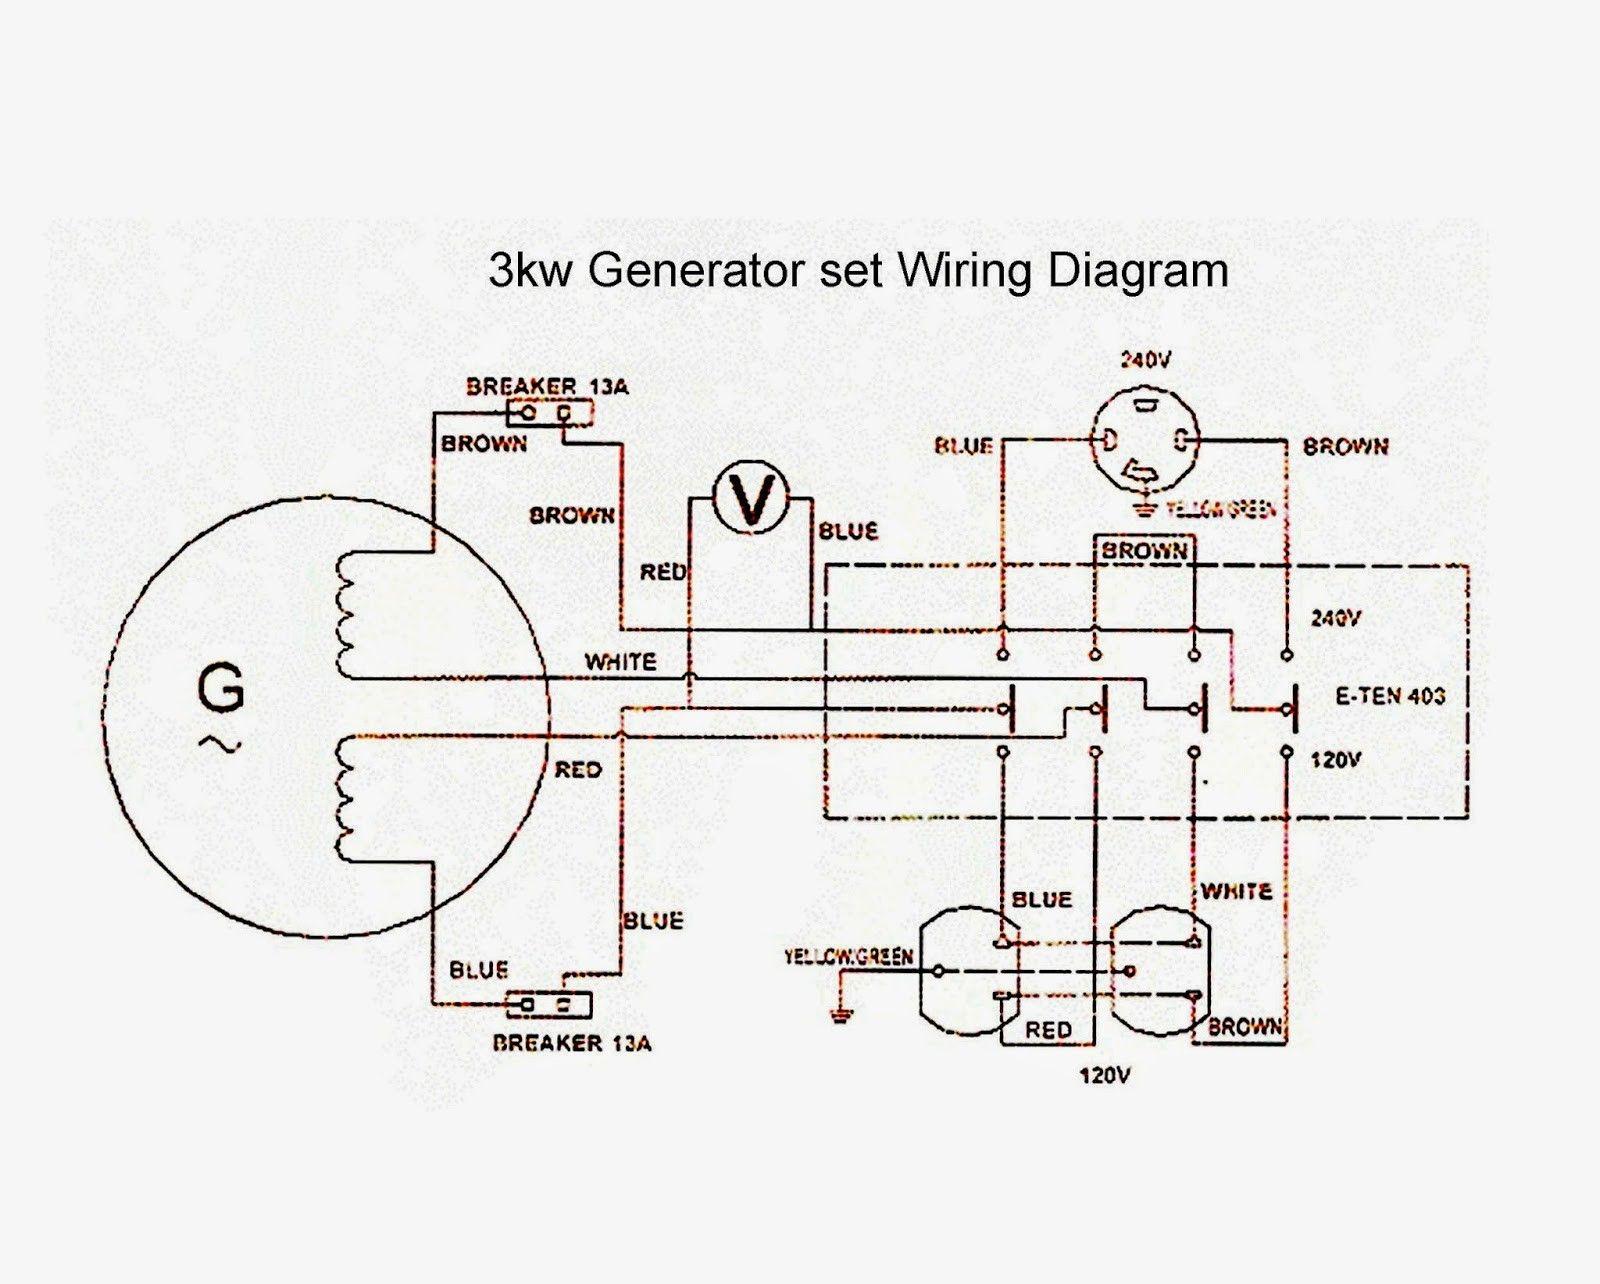 New Wiring Diagram Hitachi Starter Generator Diagram Diagramsample Diagramtemplate Wiringd Circuit Diagram Maker Circuit Diagram Electrical Circuit Diagram